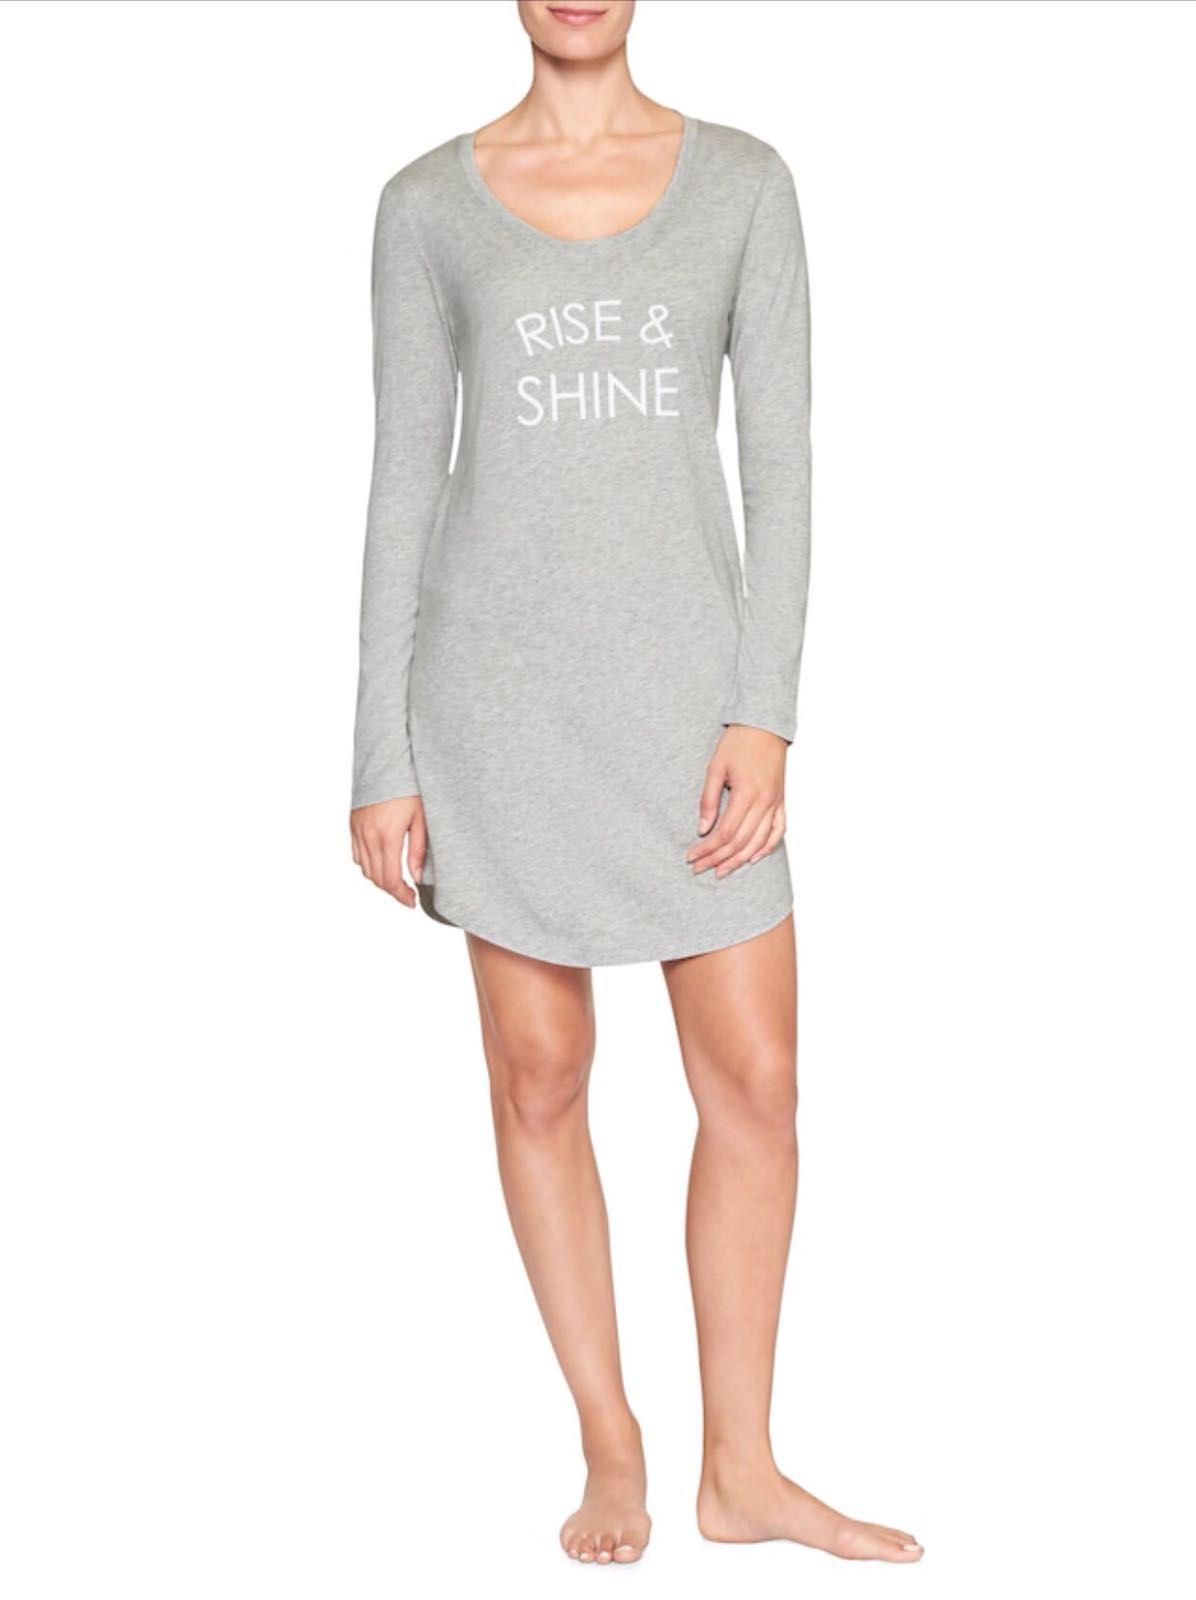 Camisola GAP Rise e Shine - Cinza